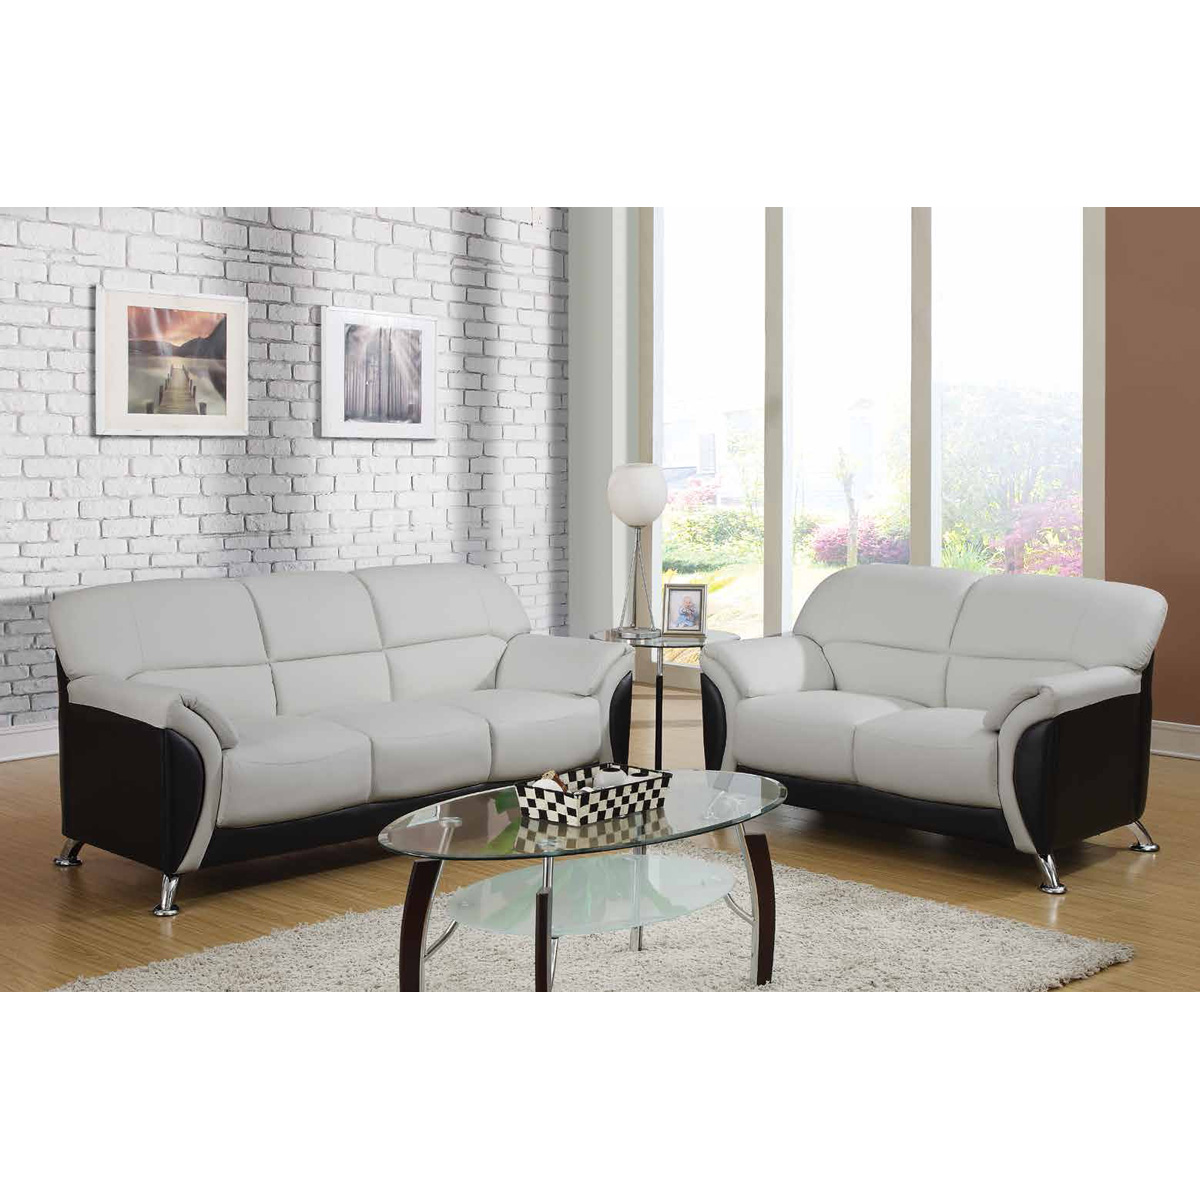 solsta sofa bed ransta dark gray 149 00 leather cleaners bristol maxwell set in light black dcg stores